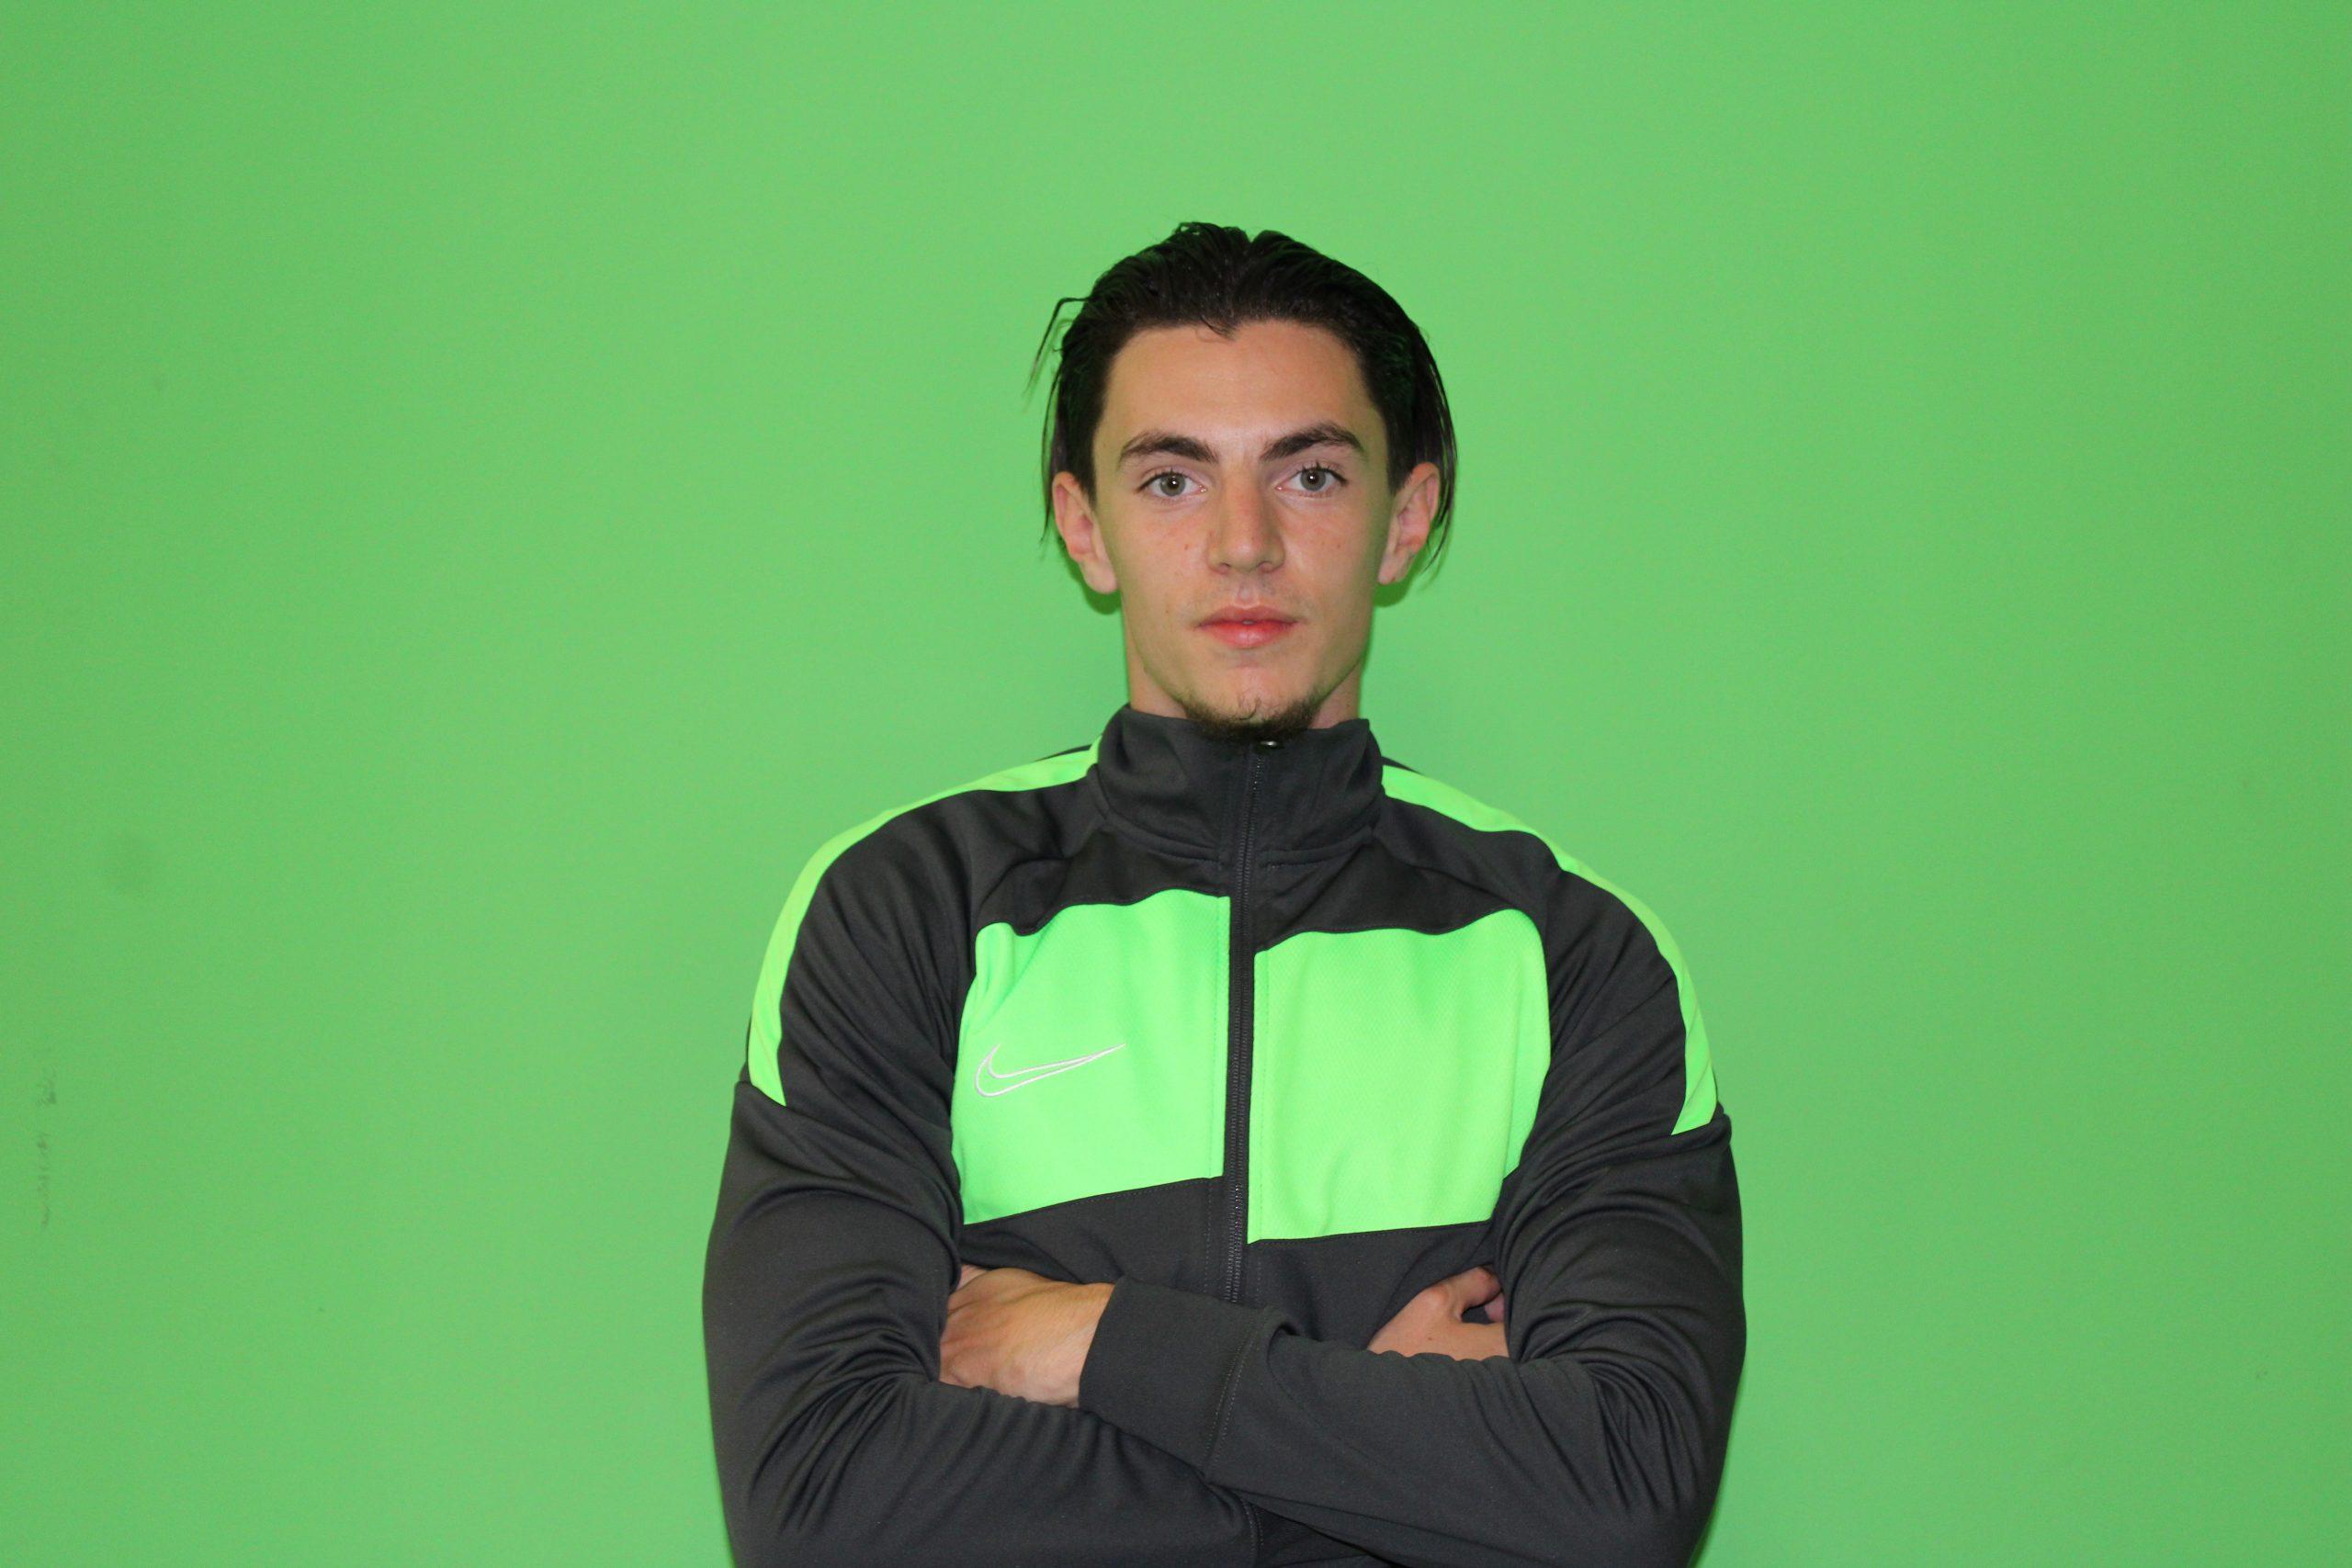 http://usepmm.fr/wp-content/uploads/2020/07/DERVILLIER-Romain-scaled.jpg